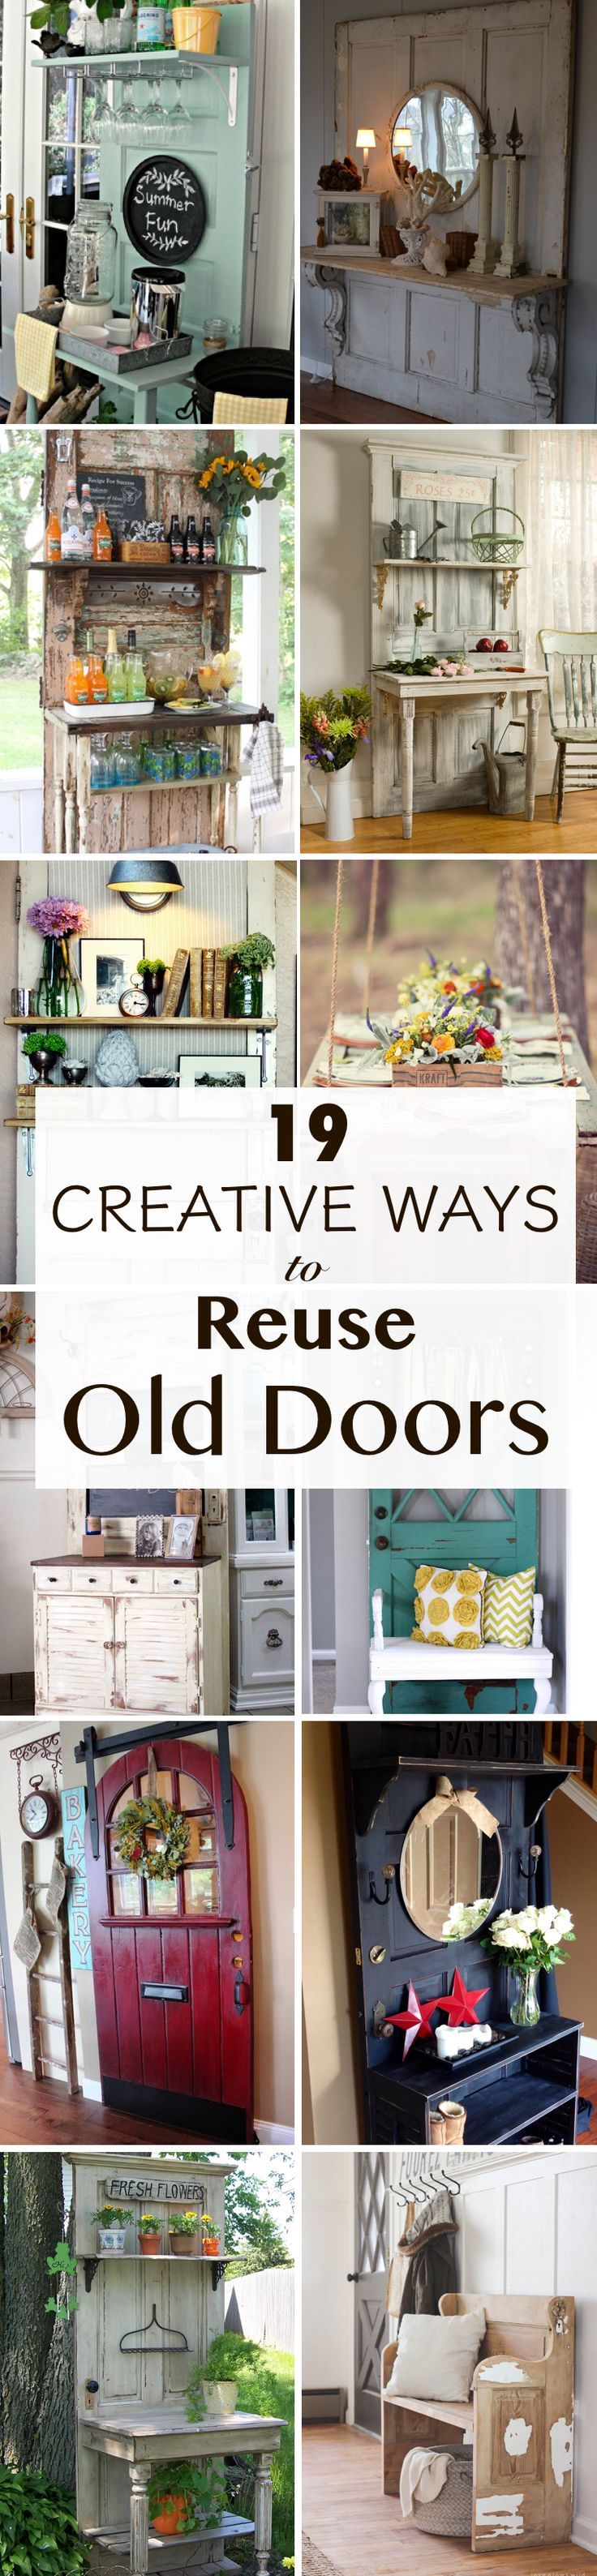 Best 25 old doors ideas on pinterest for Creative old door ideas